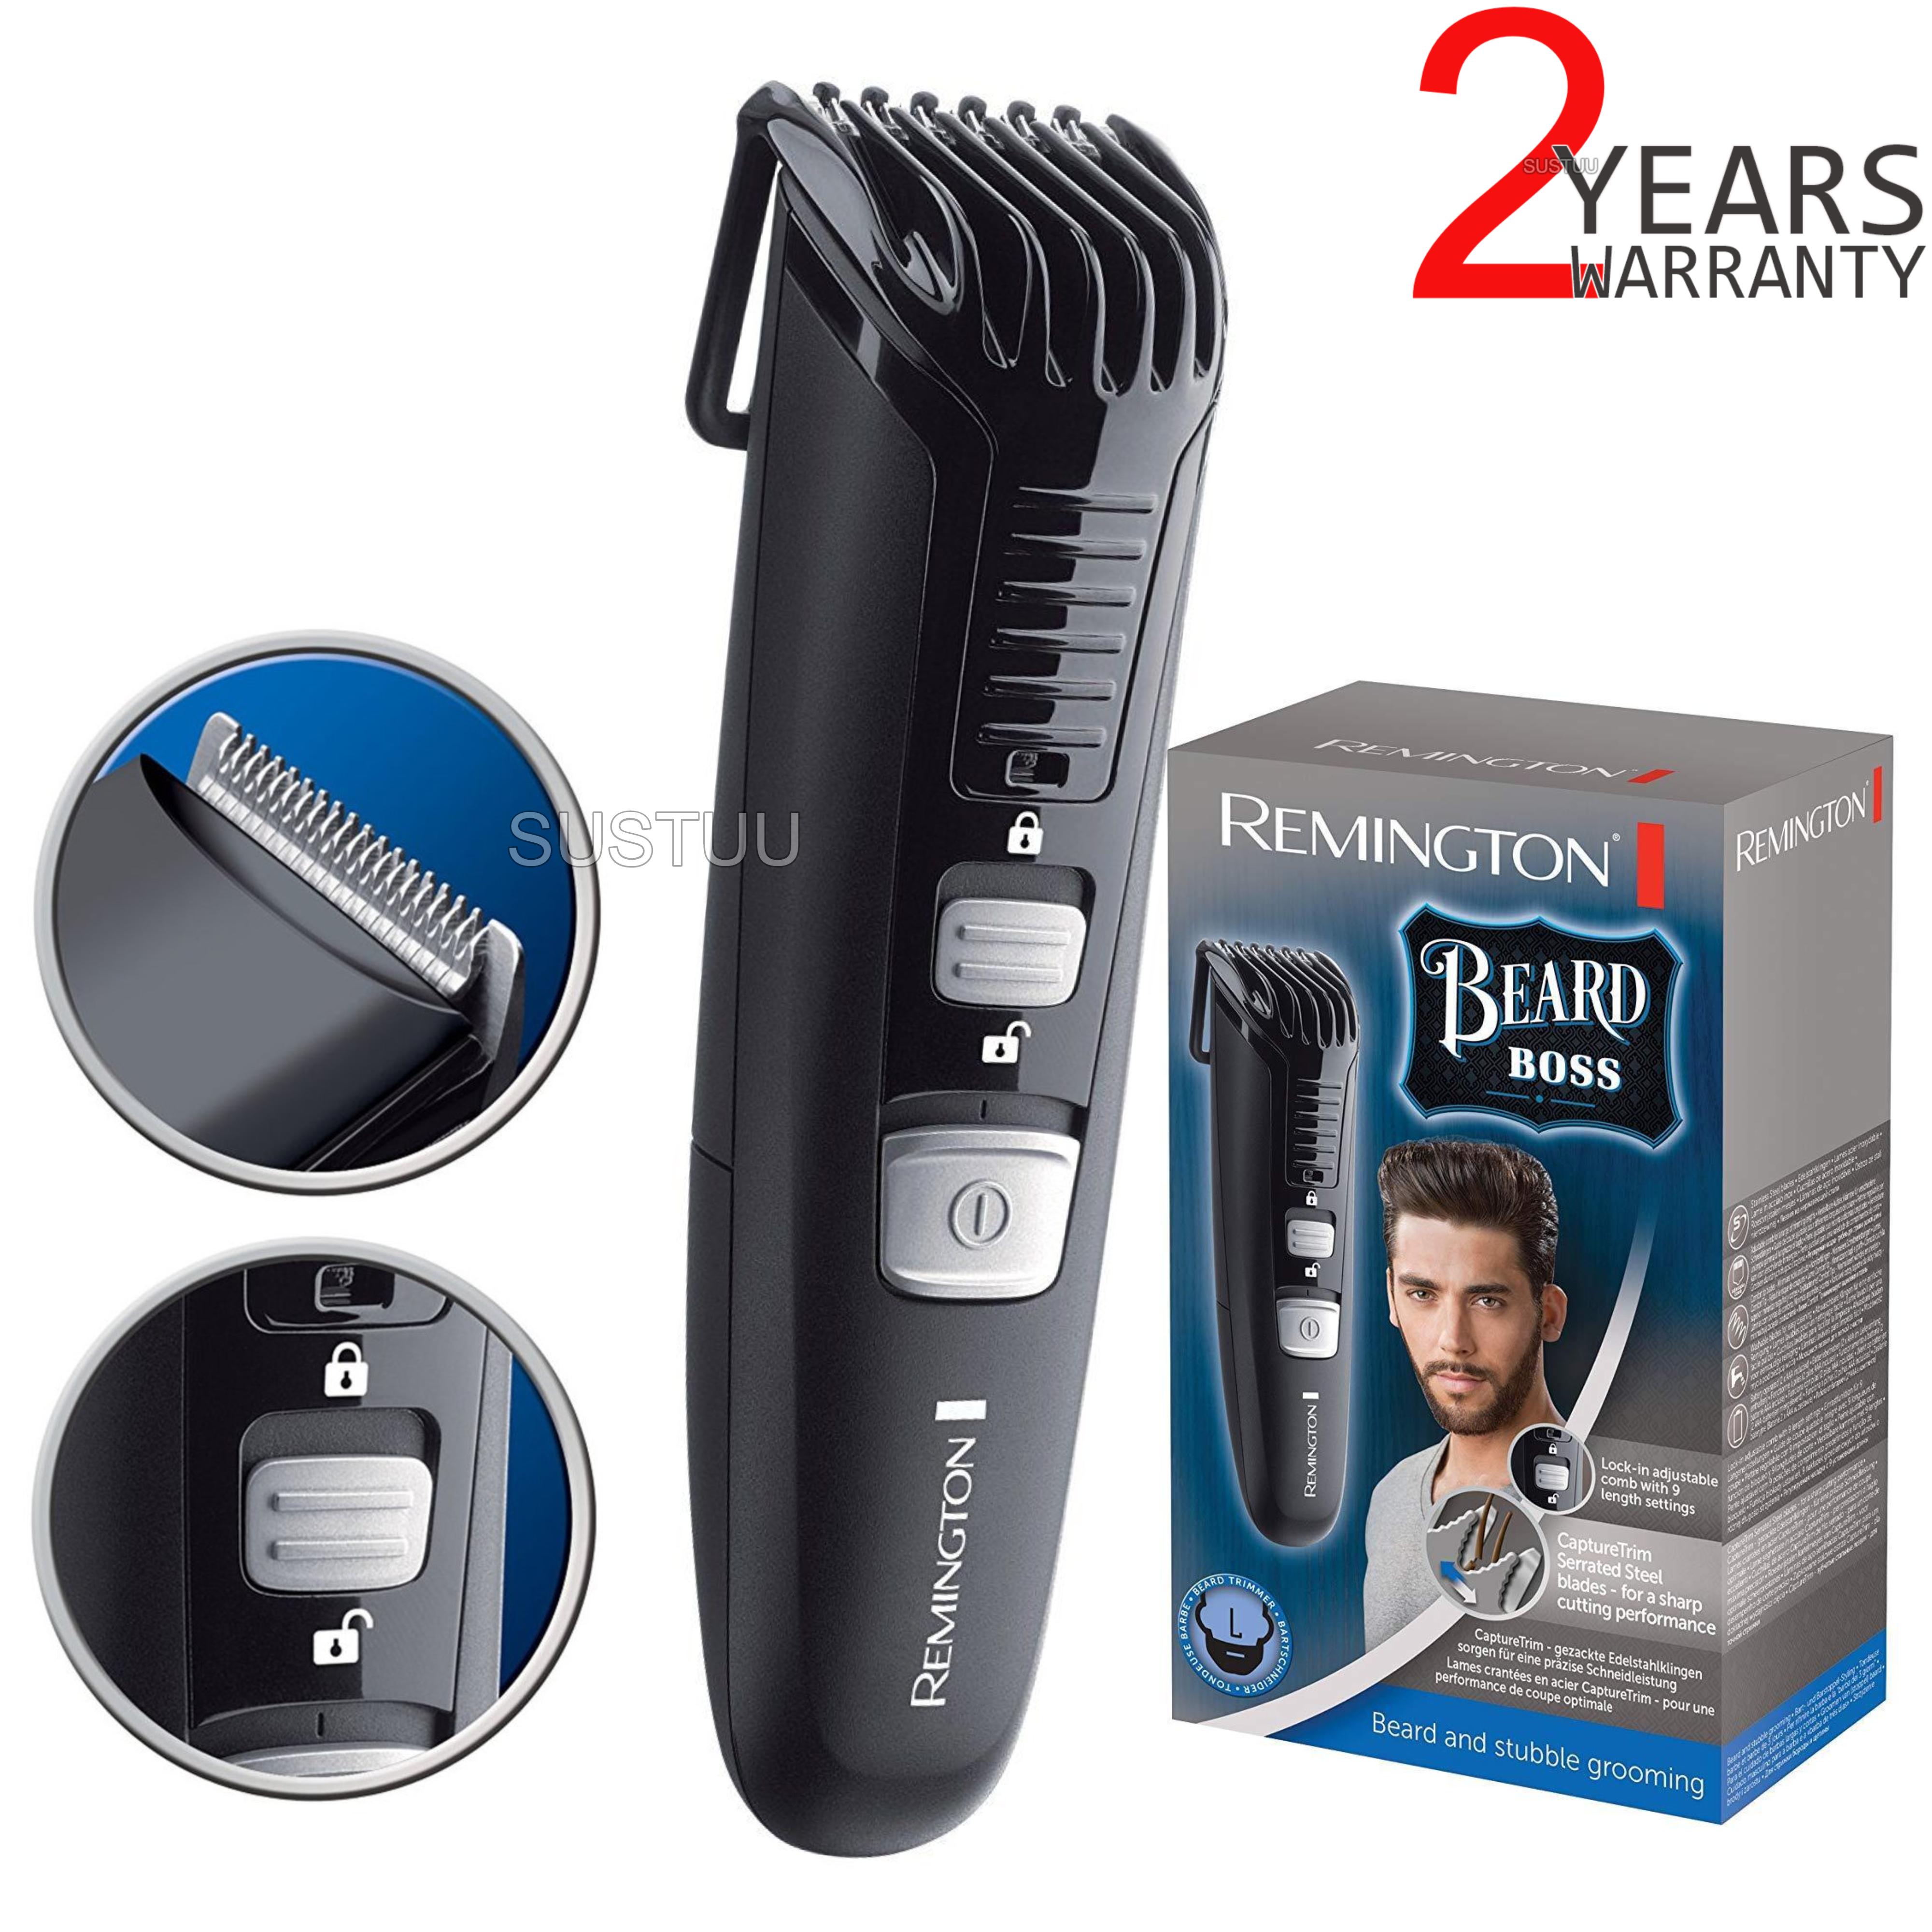 Remington Beard & Stubble Grooming Kit | Trimmer & Shaver | 11 Length Settings | Black